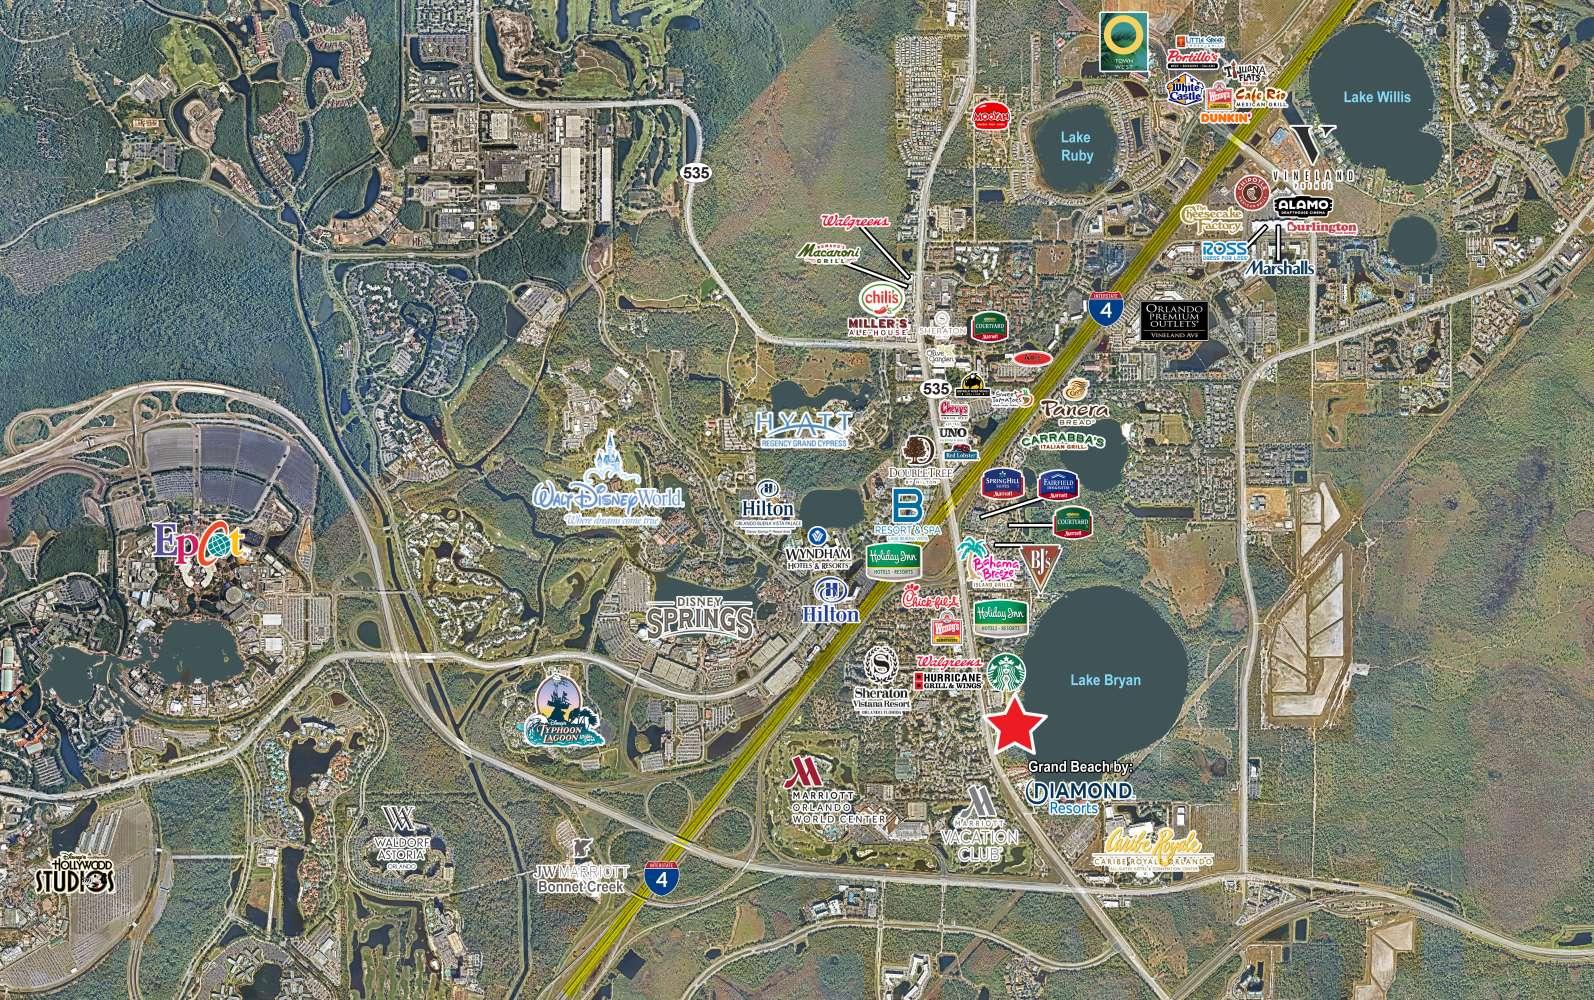 Land Orlando, 32821 - 13651 South Apopka Vineland Road